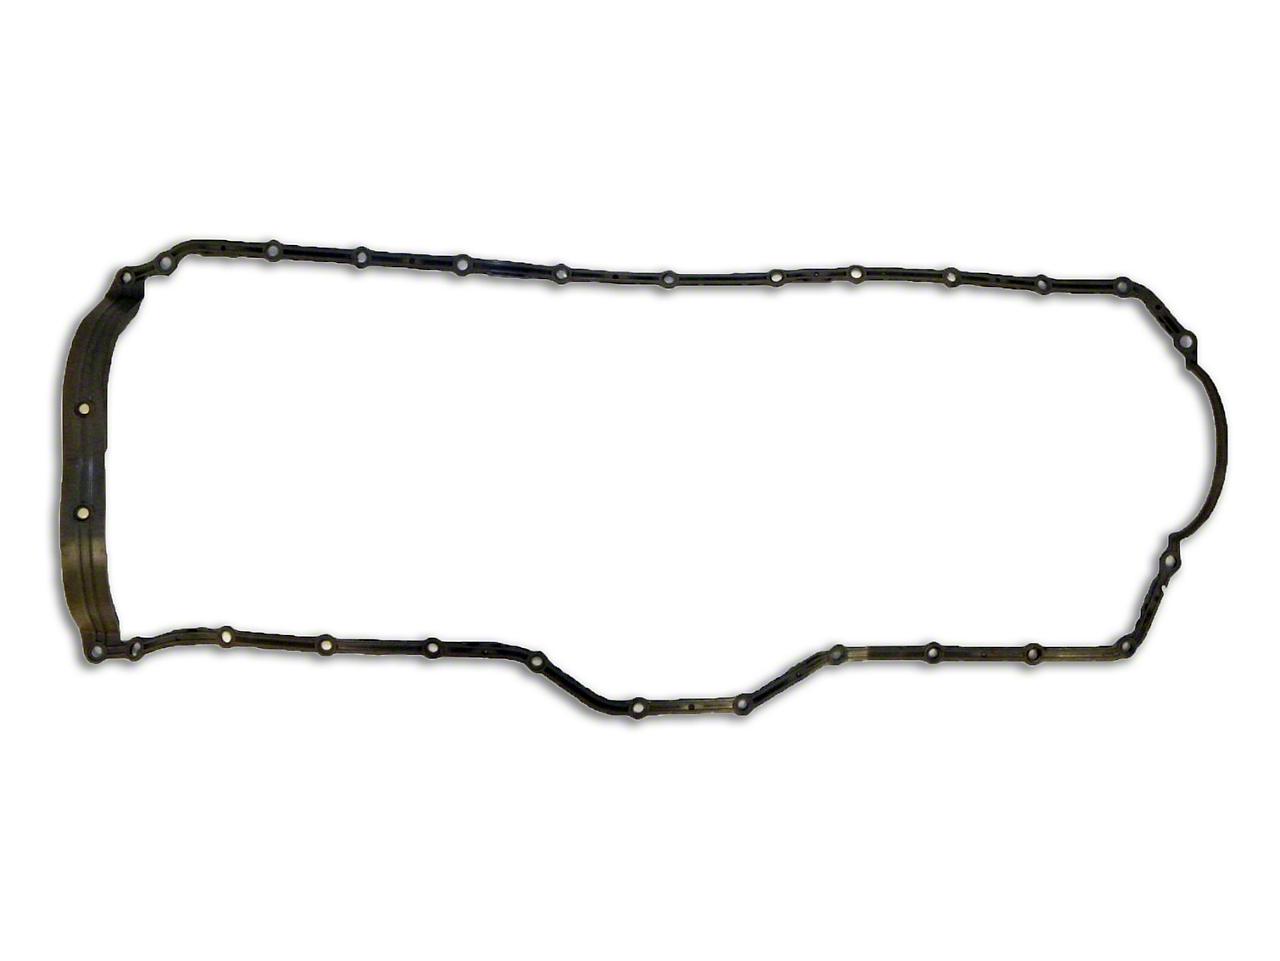 Oil Pan Gasket (87-06 4.0L or 4.2L Jeep Wrangler YJ & TJ)